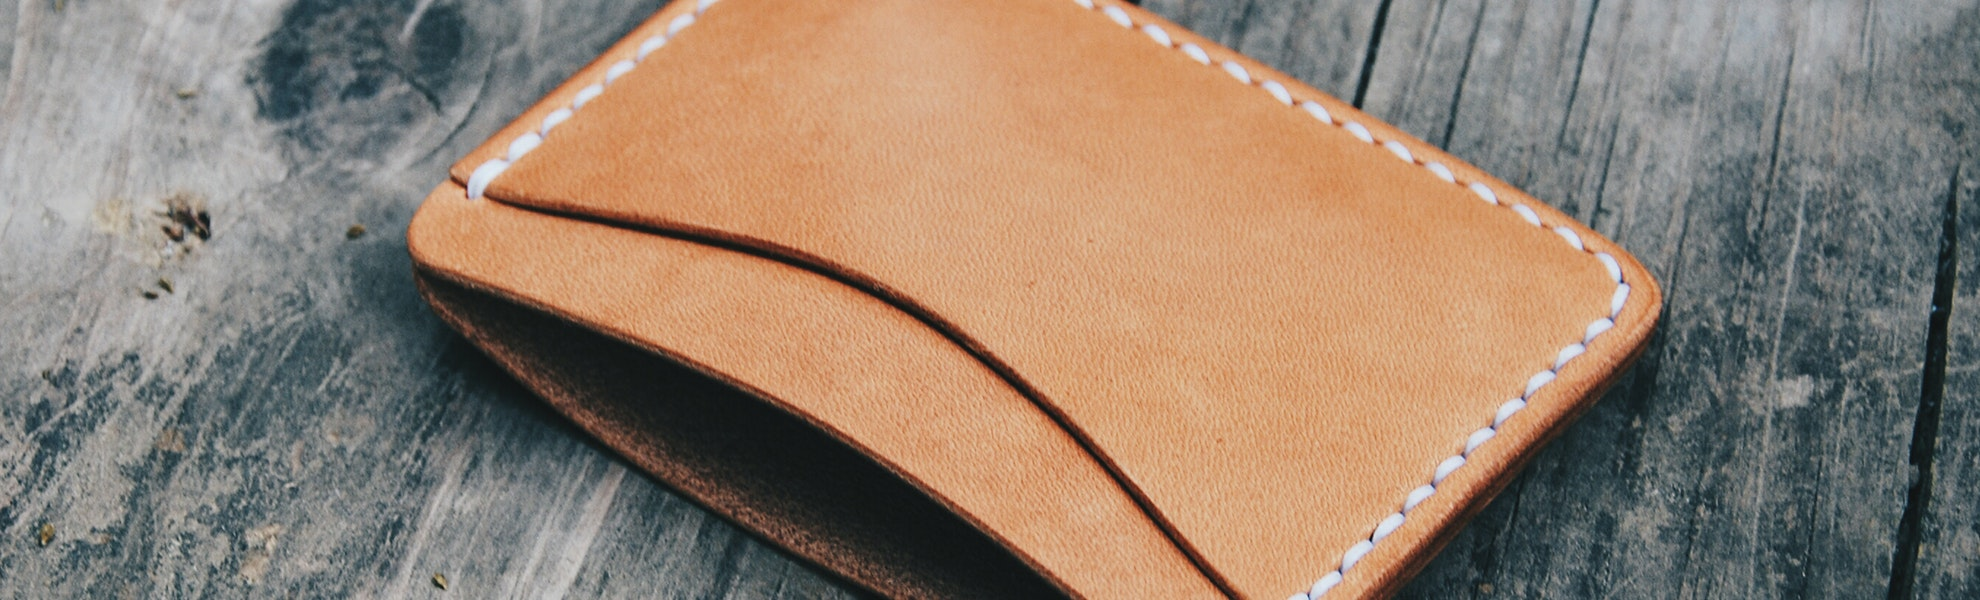 Faler Brand Minimalist Horween Wallet